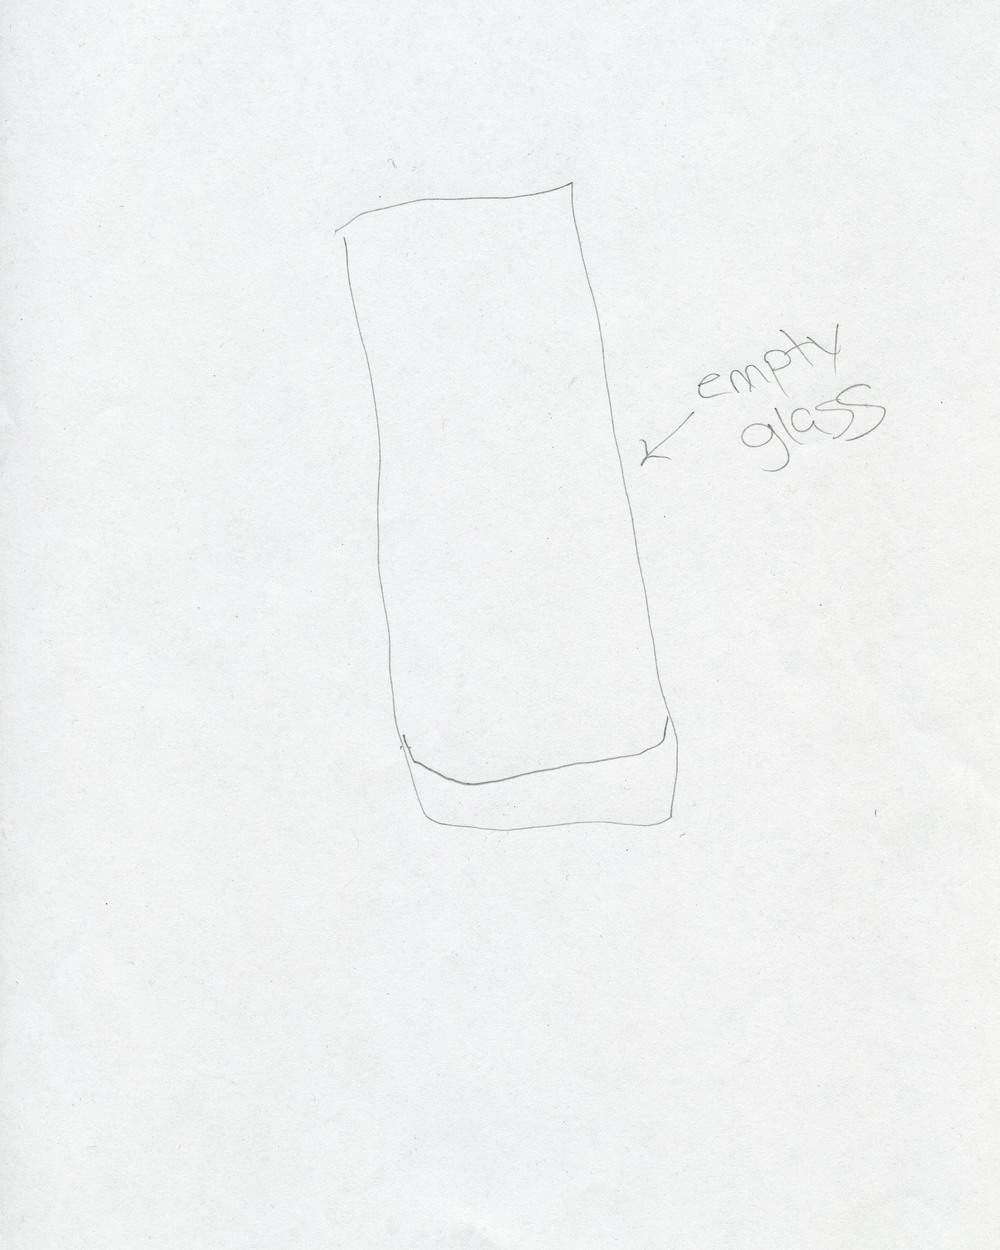 emptyglass.jpg